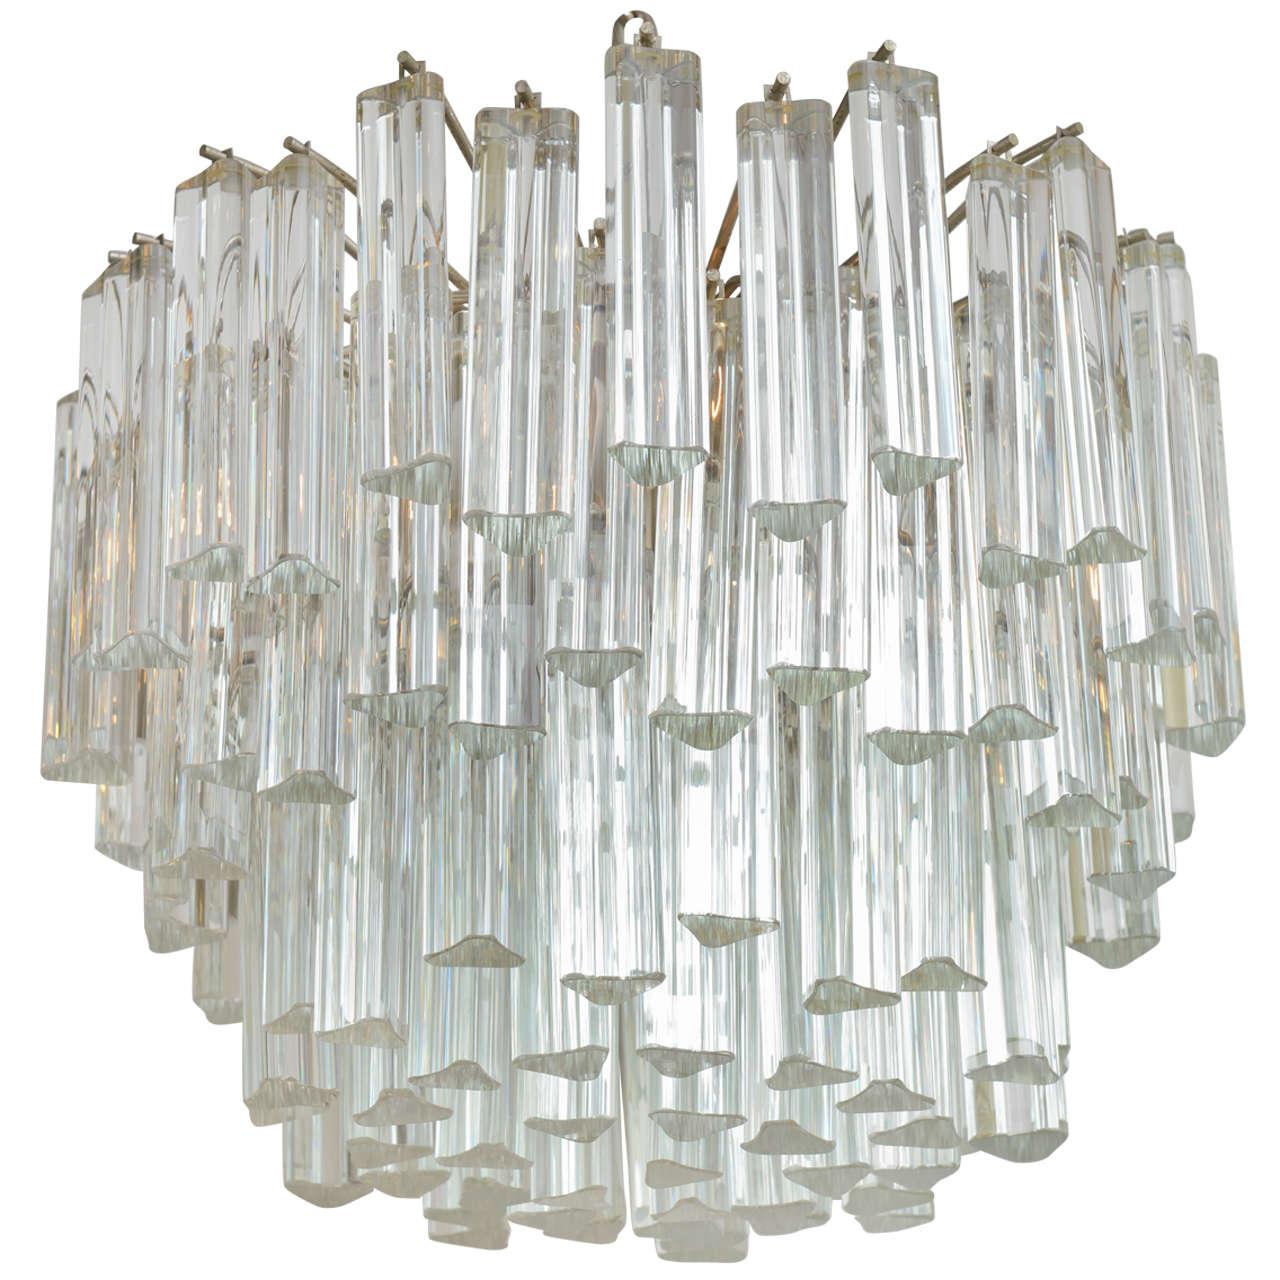 Lush Camer Glass Chandelier with Venini Triedri Crystals